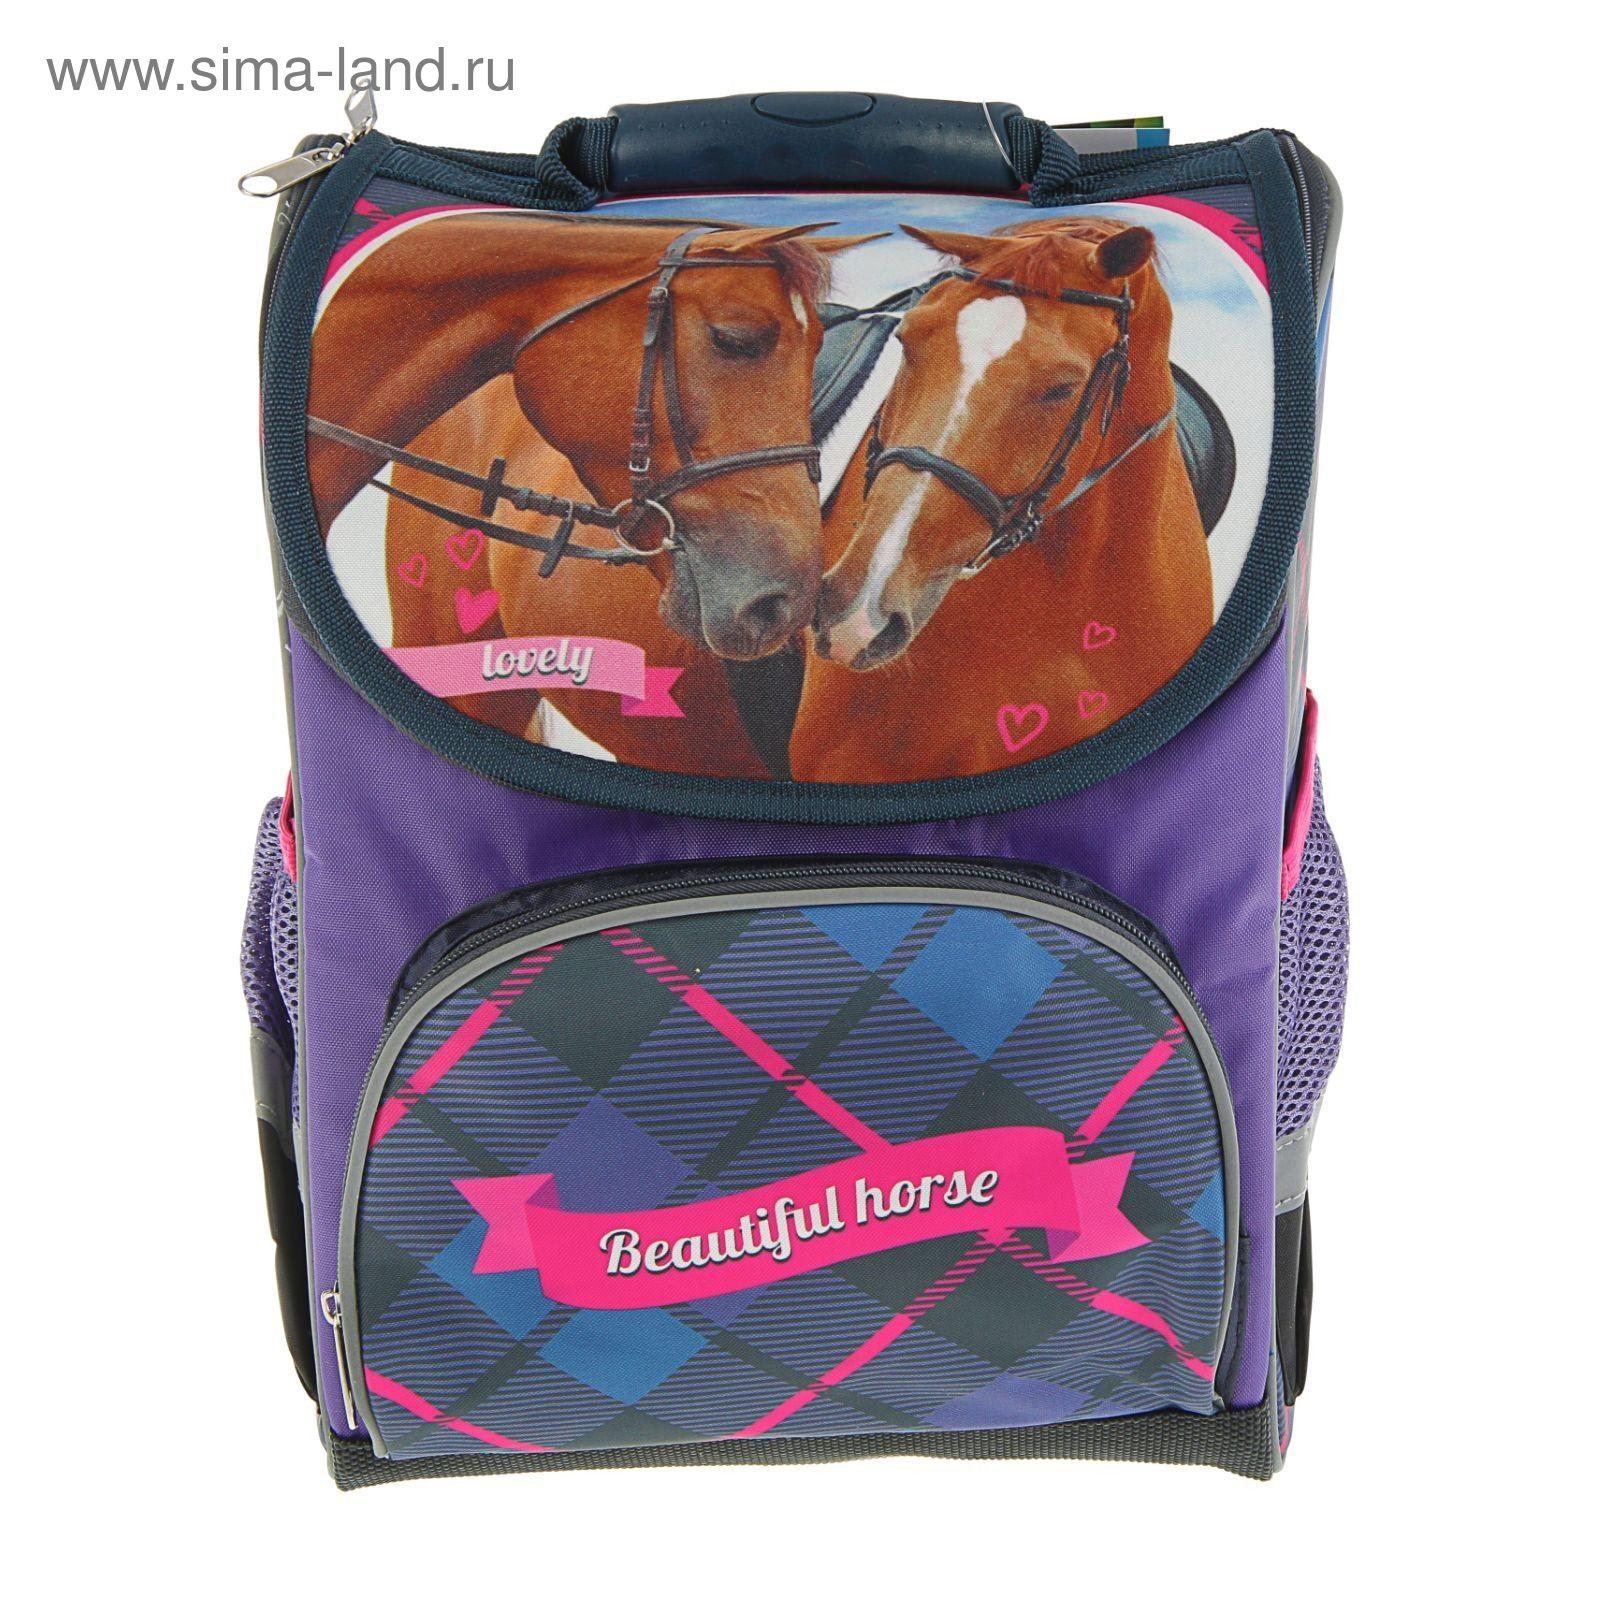 917e74742f5d Ранец Стандарт Limpopo Premium box 35x28x16 см, эргономичная спинка